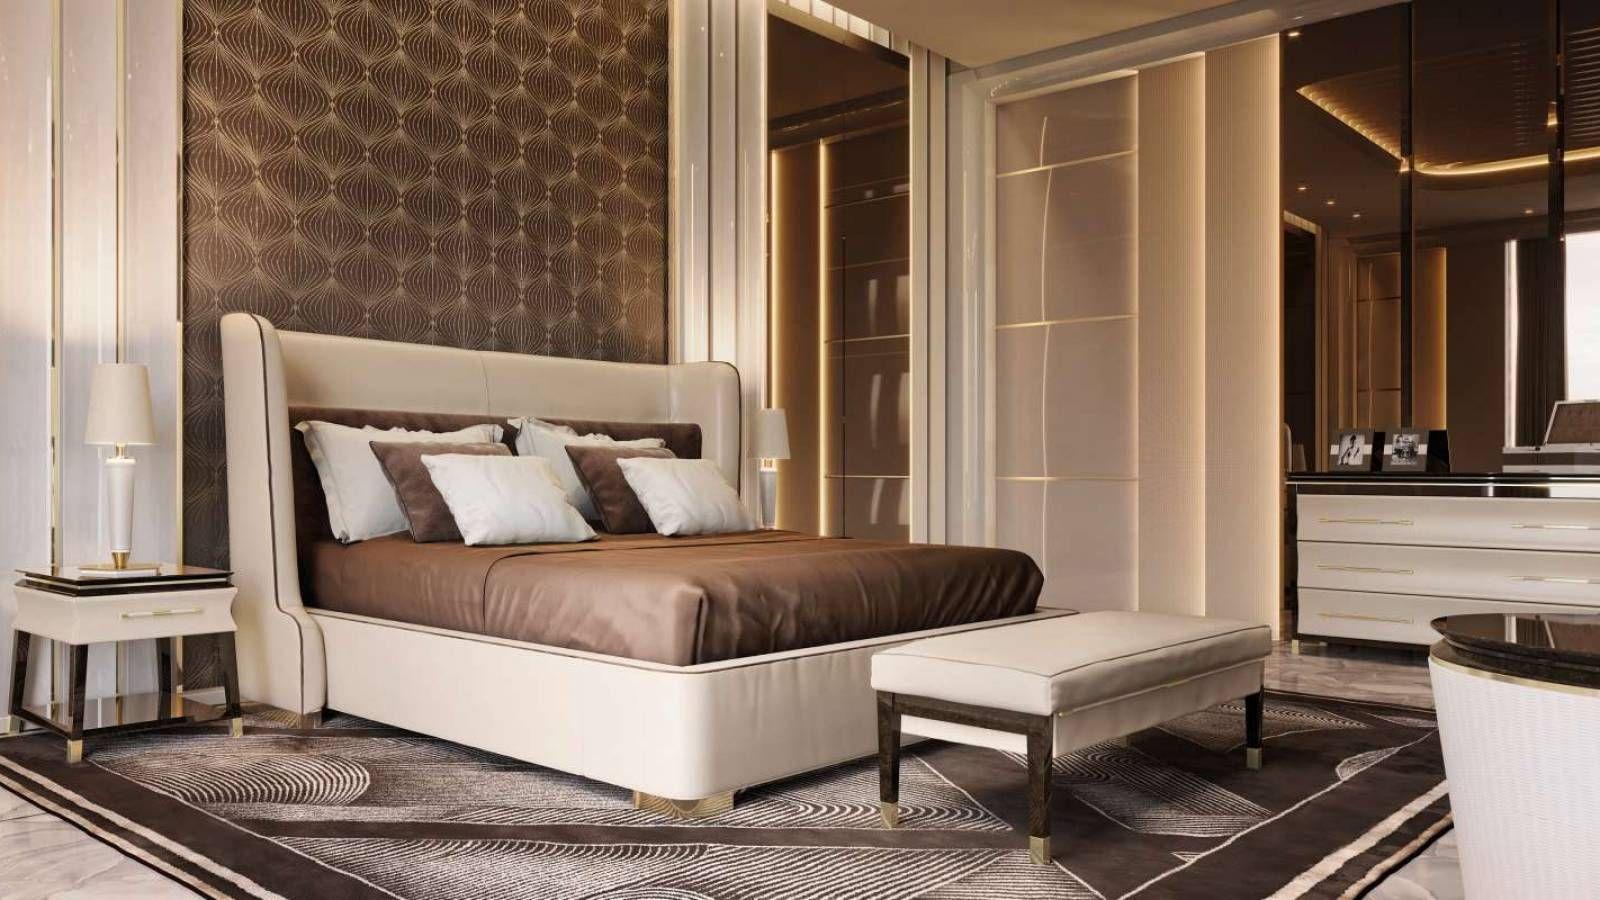 Home Italia Turri Arredamento Made In Italy Furniture Luxury Furniture Interior Design Bedroom